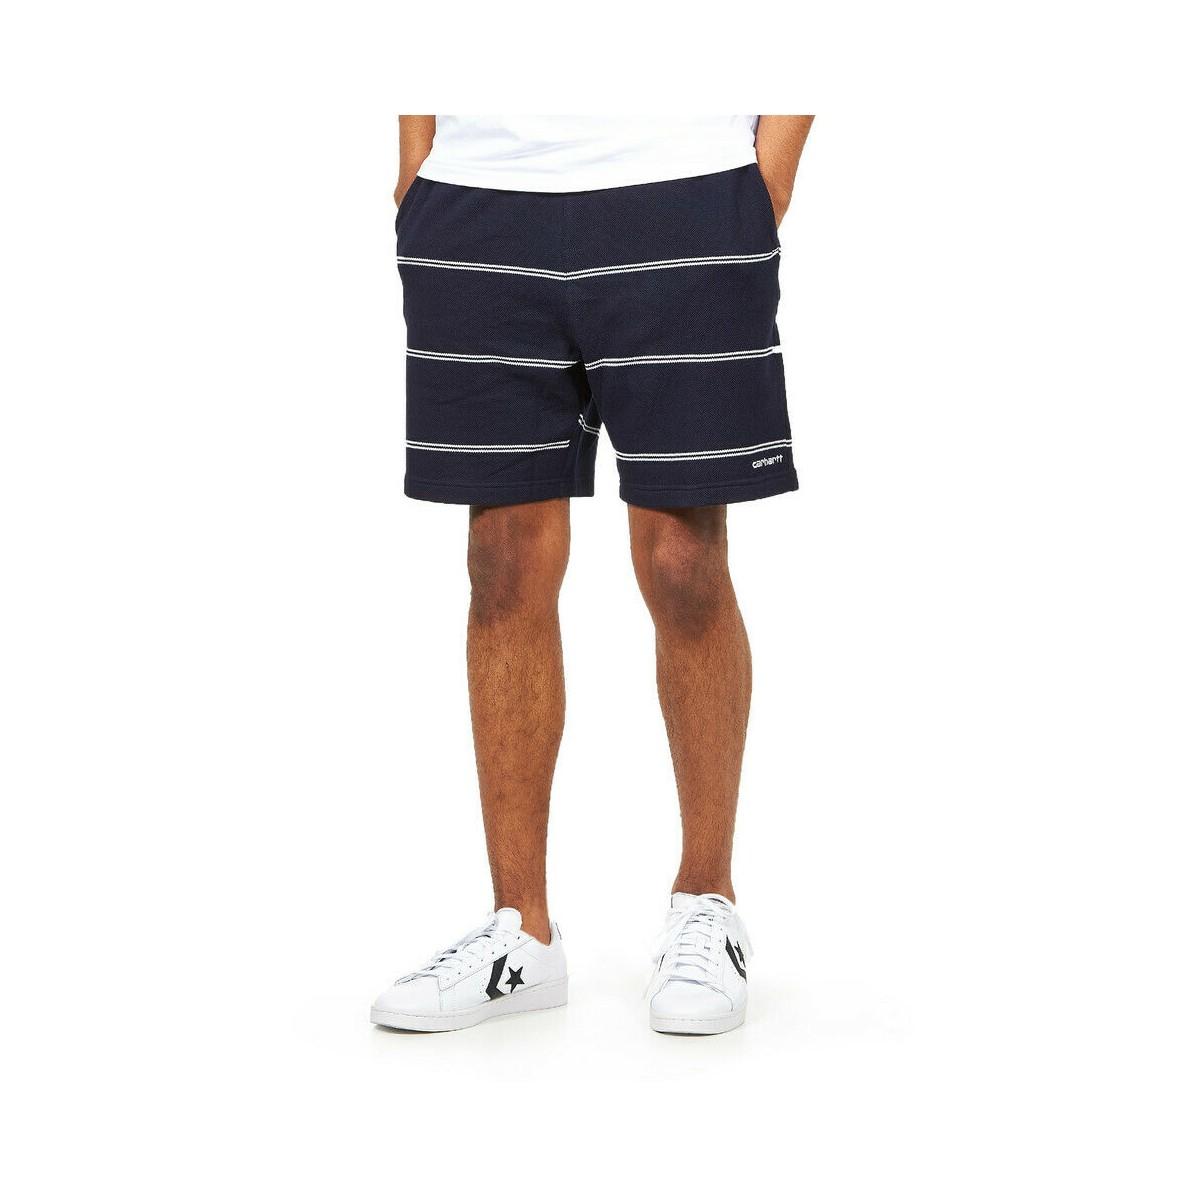 Carhartt WIP - Short jogging à rayures